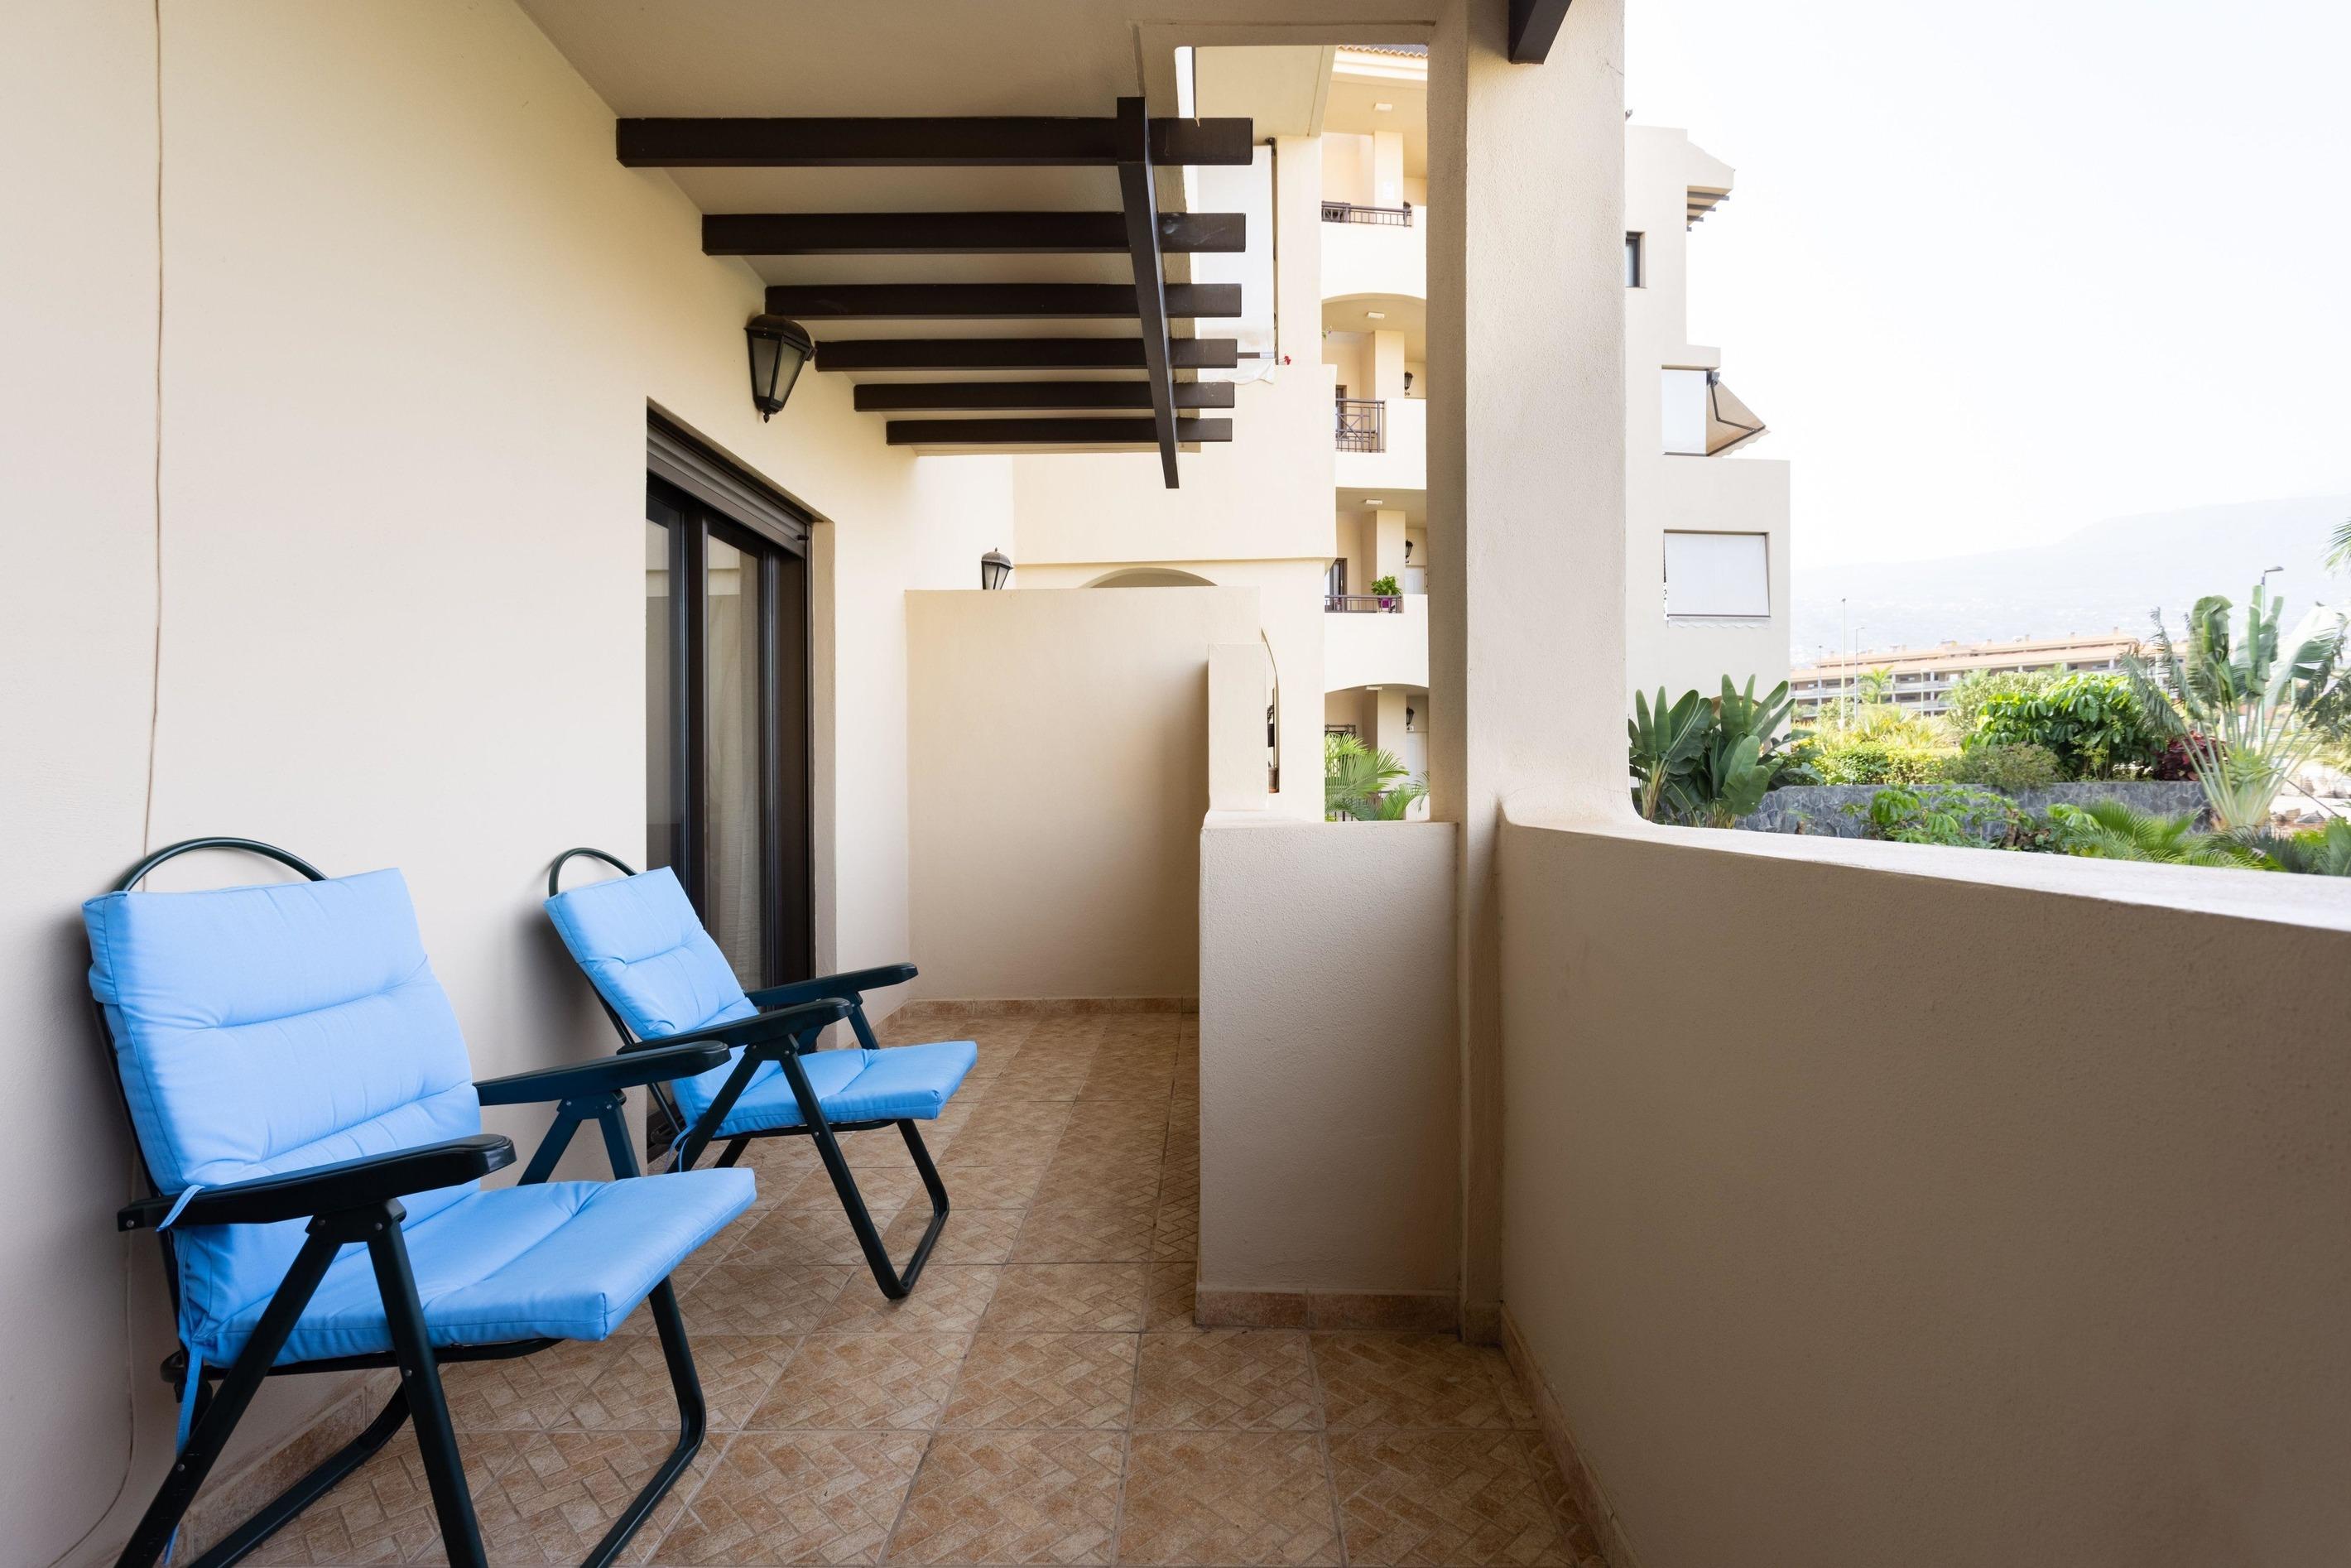 Appartement de vacances Fewo Mar y Teide Romantico, grosszügig, mit 2 Terrassen, Pool, Parkplatz,  Sicht auf Meer  (2492990), Puerto de la Cruz, Ténérife, Iles Canaries, Espagne, image 9